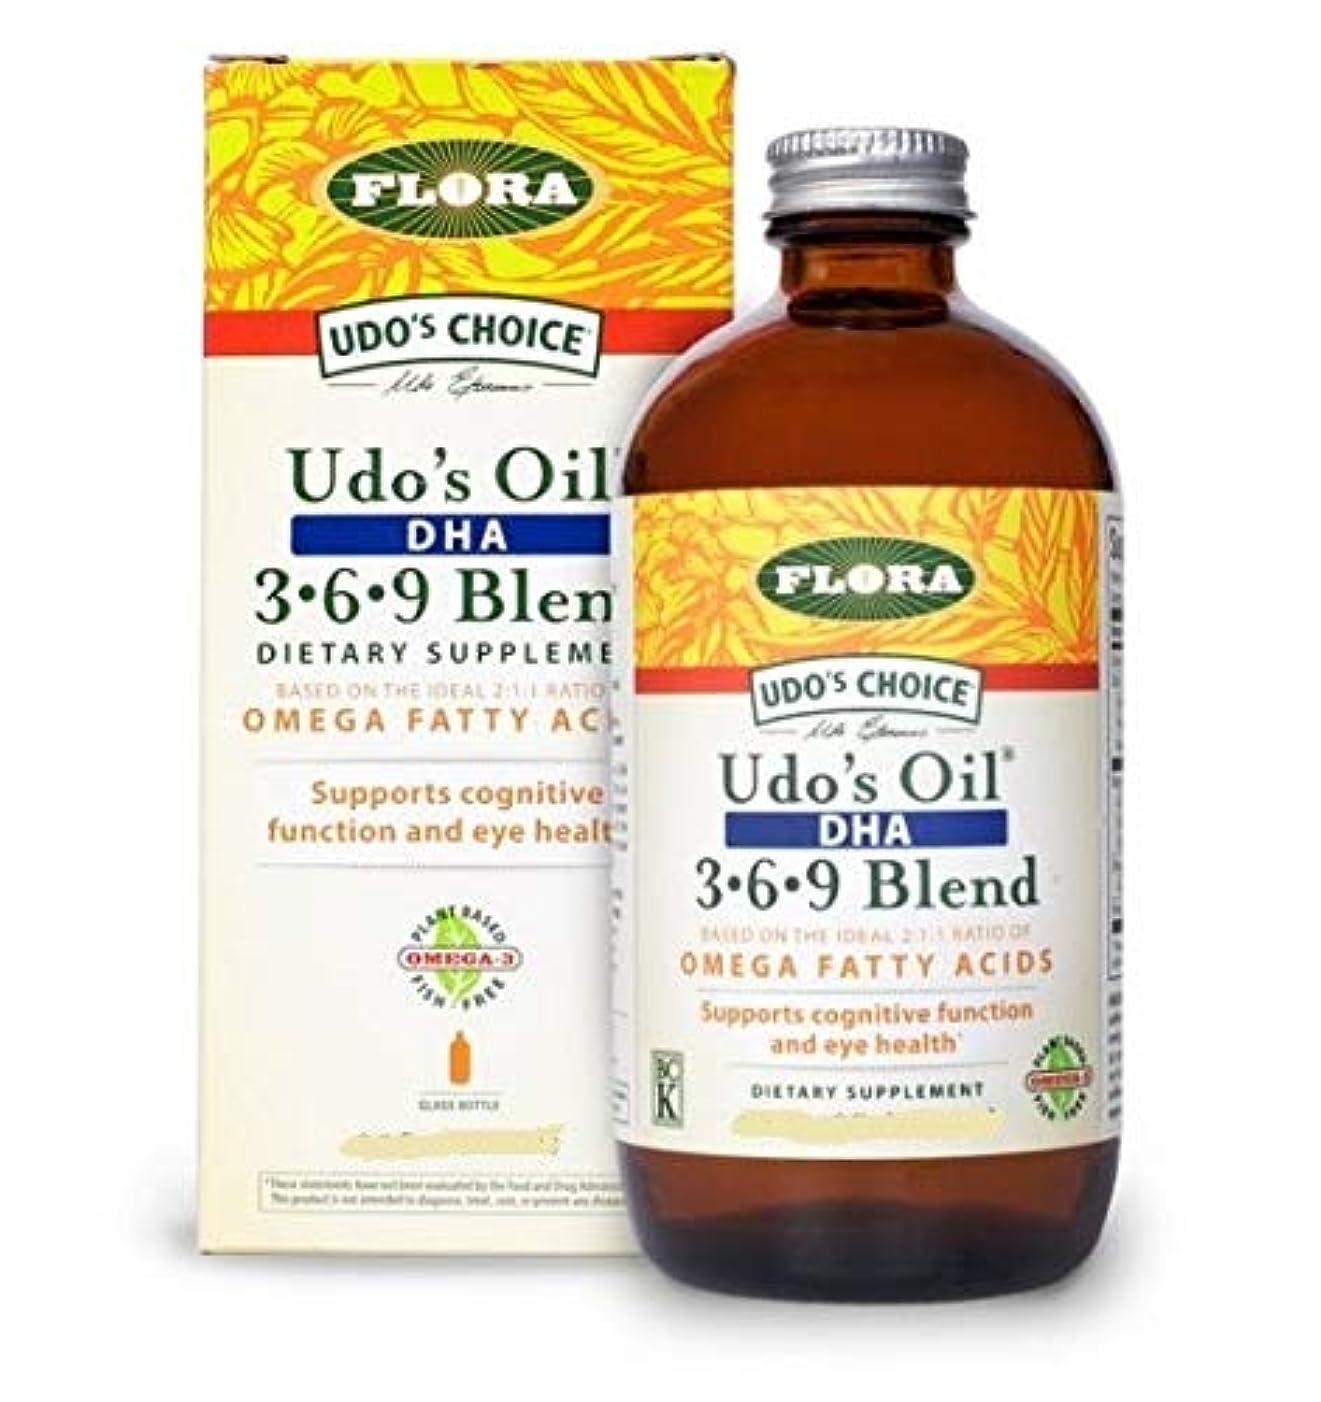 生理囚人不適Udo's Oil DHA 3-6-9 Blend 17 fl.oz